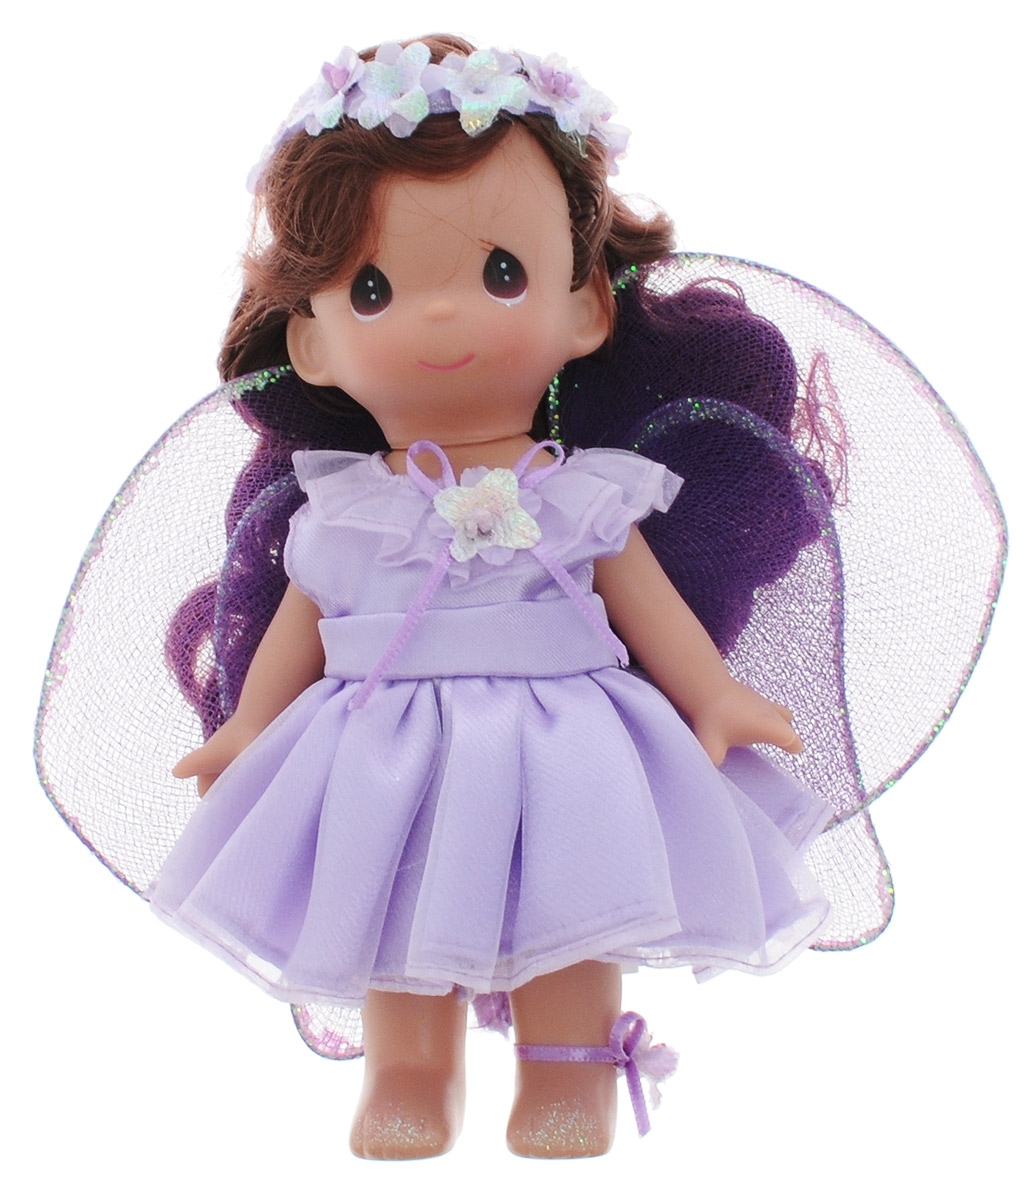 Precious Moments Мини-кукла Фея Фиалка precious moments мини кукла бабочка цвет наряда розовый сиреневый